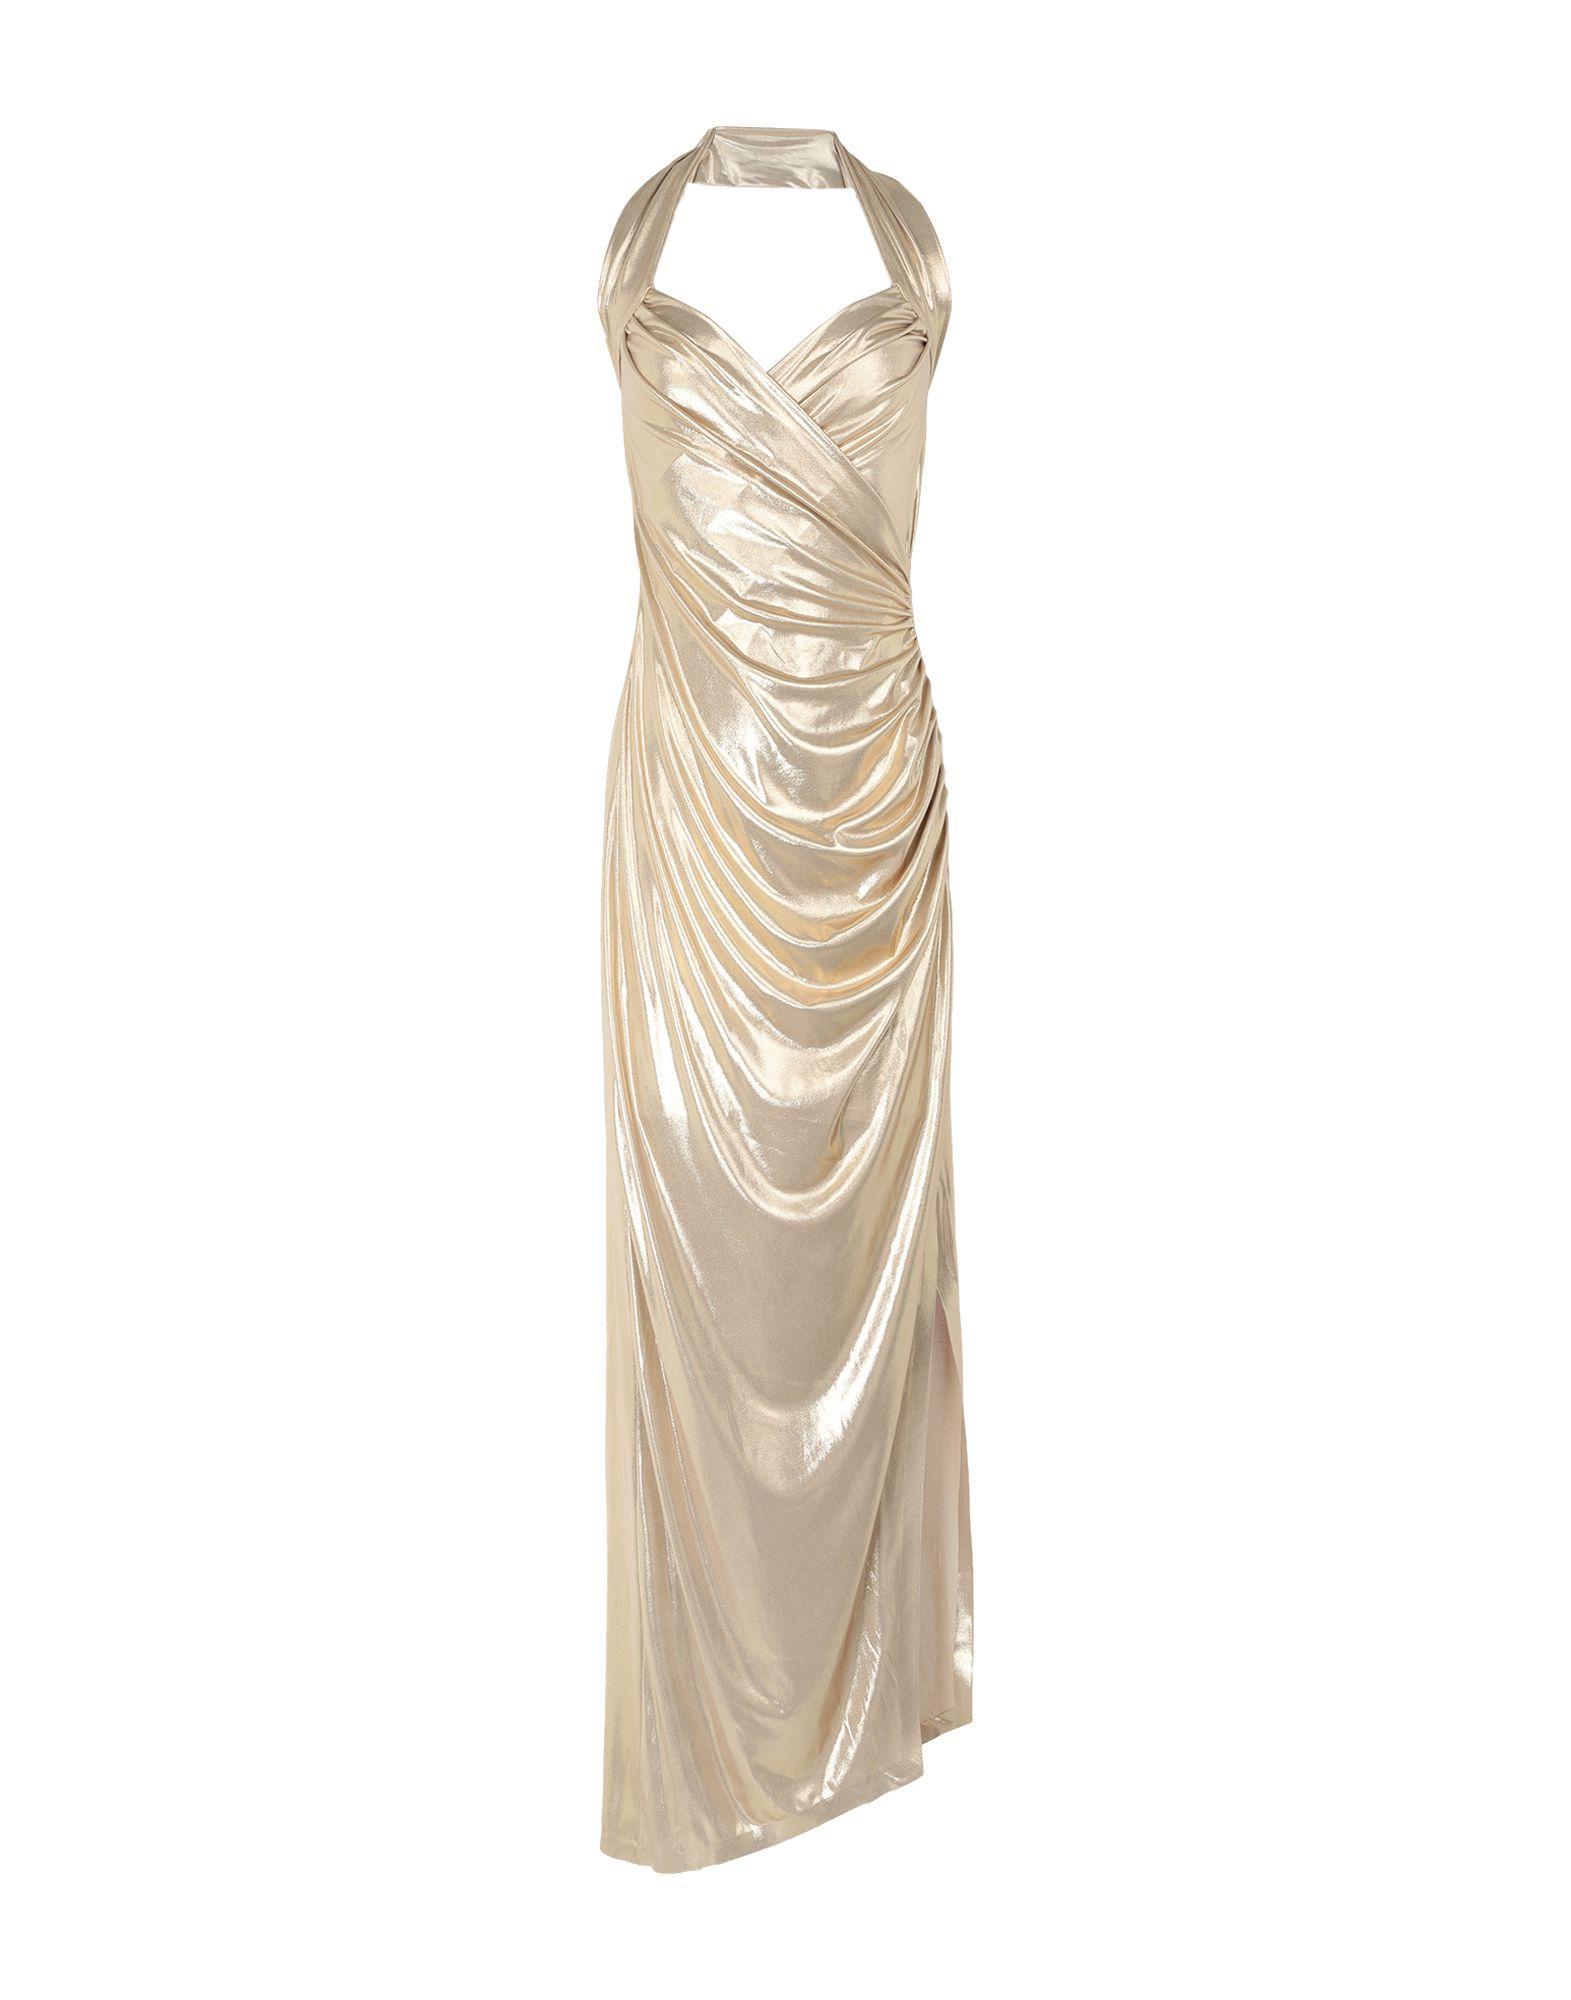 Norma Kamali Gold Full Length Draped Dress